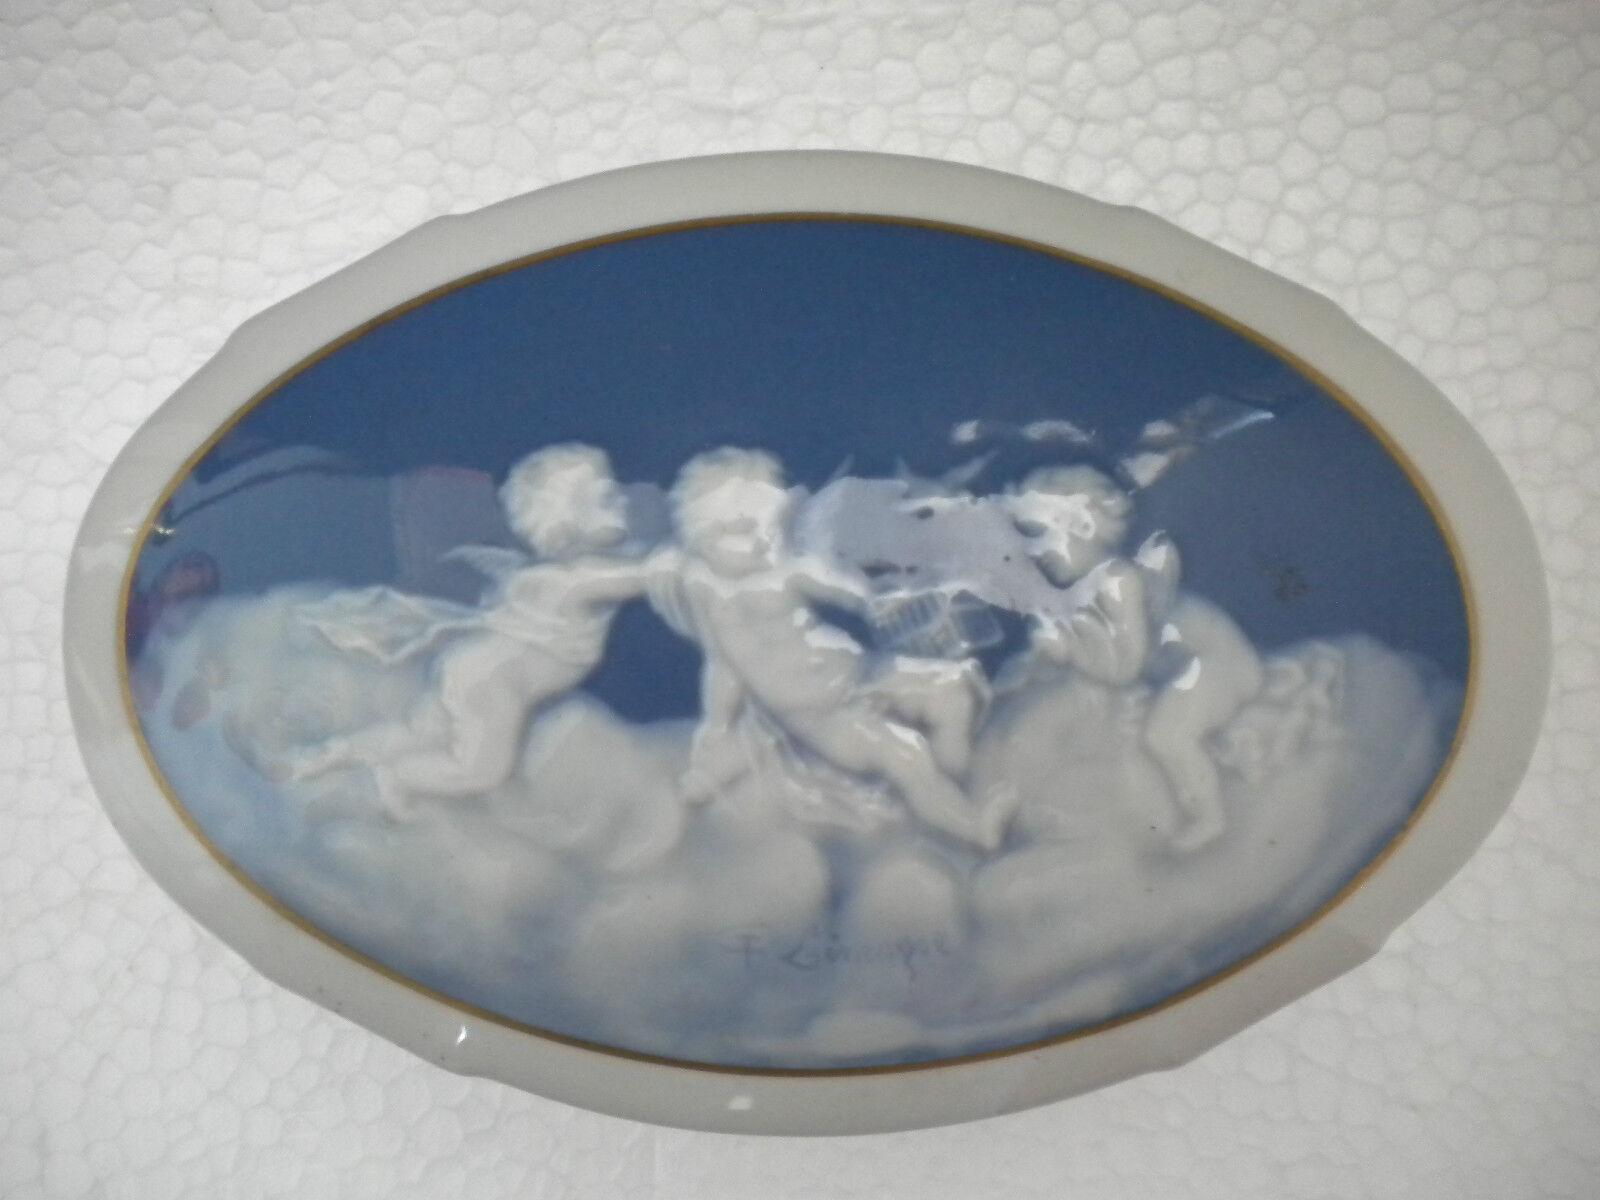 bonbonni re porcelaine de limoges tharaud eur 120 00 picclick fr. Black Bedroom Furniture Sets. Home Design Ideas